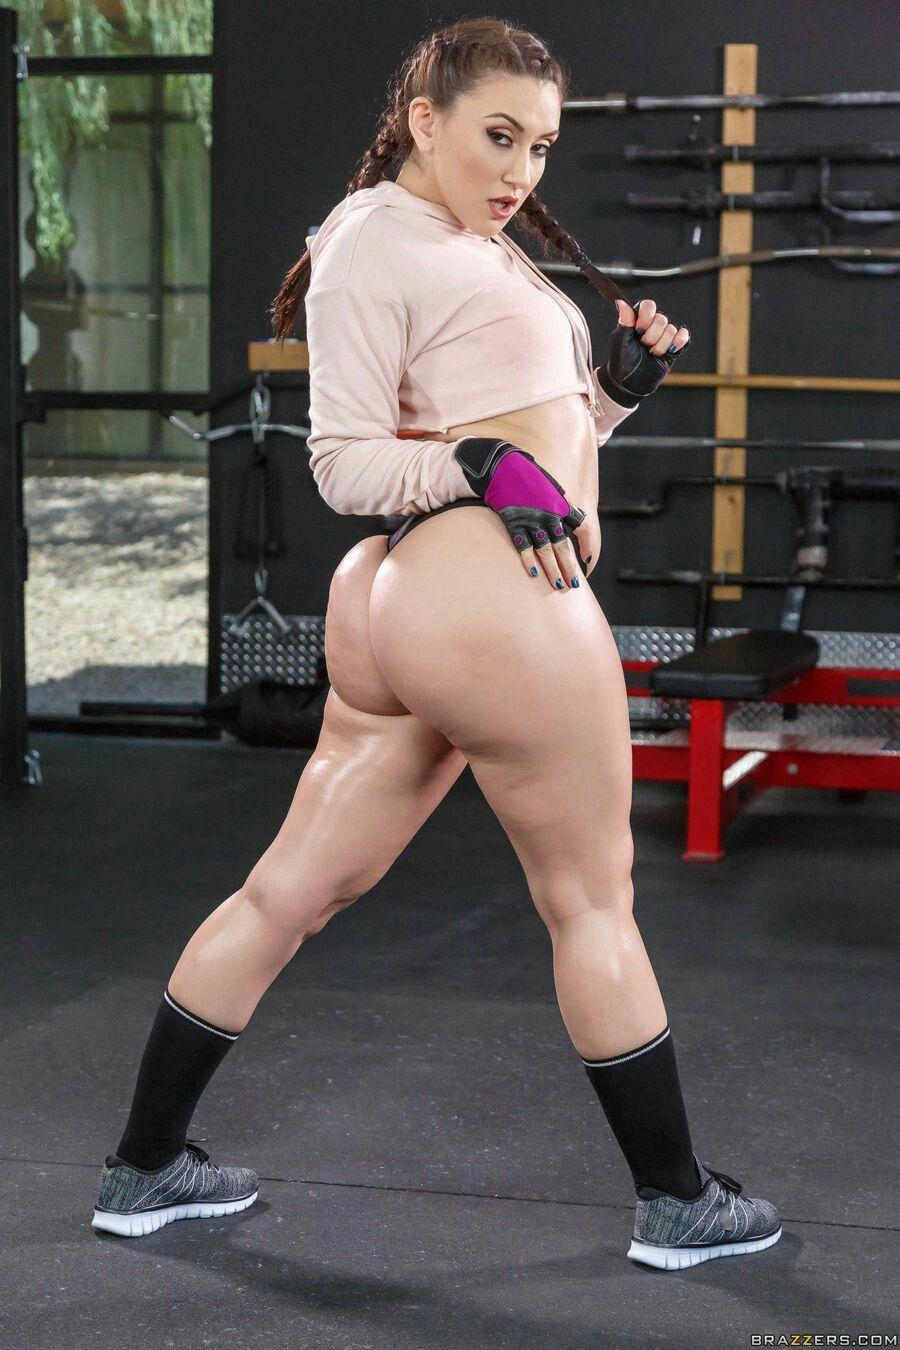 Mandy muse gym videos